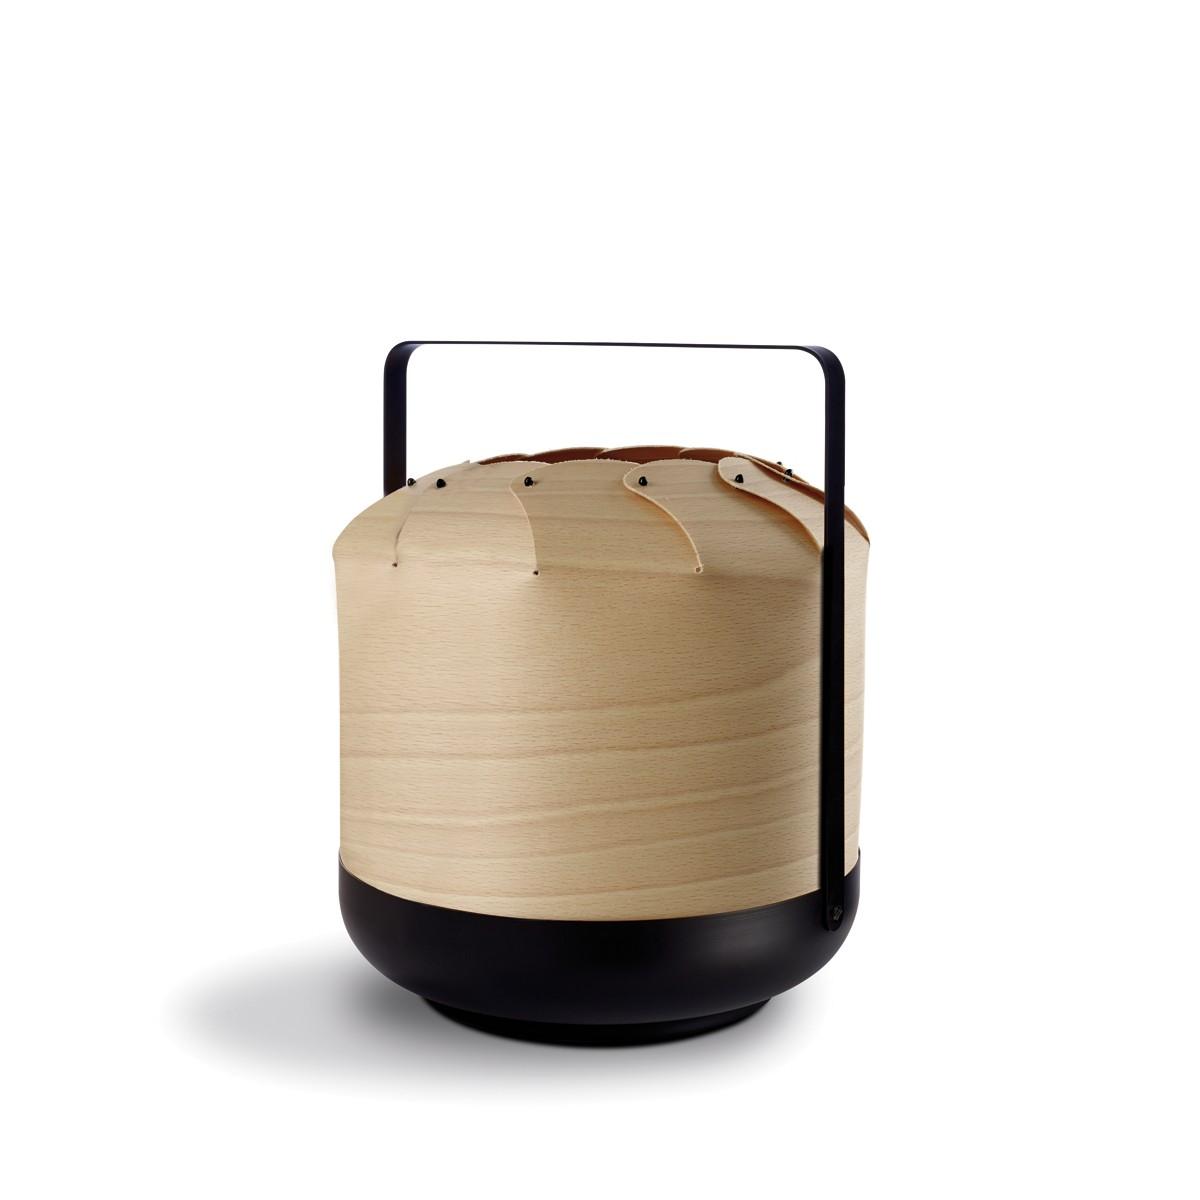 LZF Lamps Chou Short Small Tischleuchte, Buche